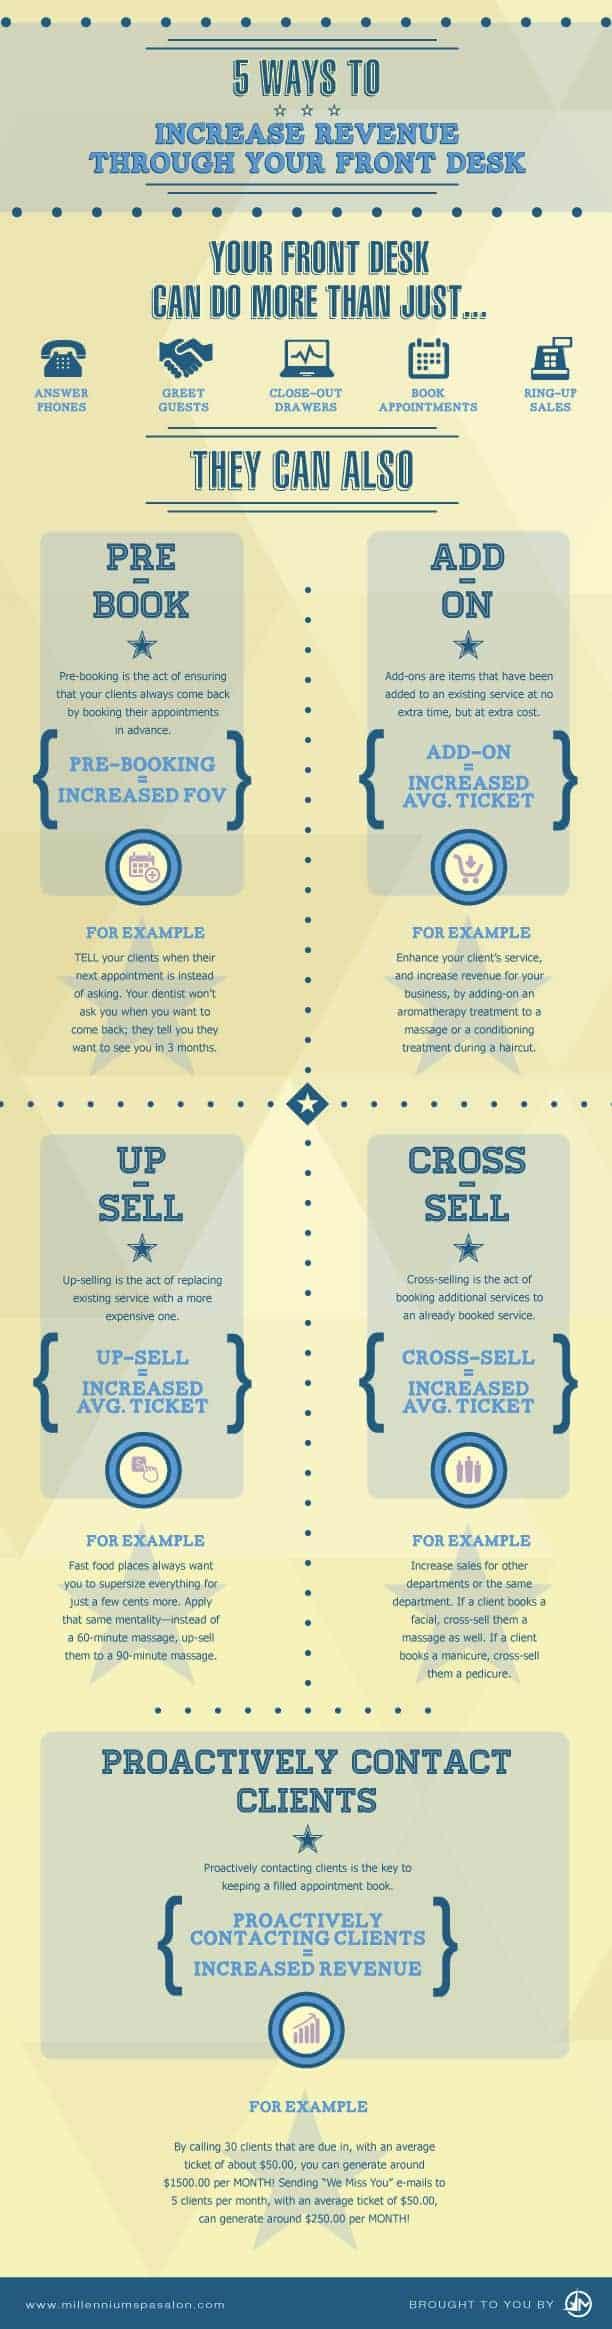 5-ways-to-increase-revenue infographic